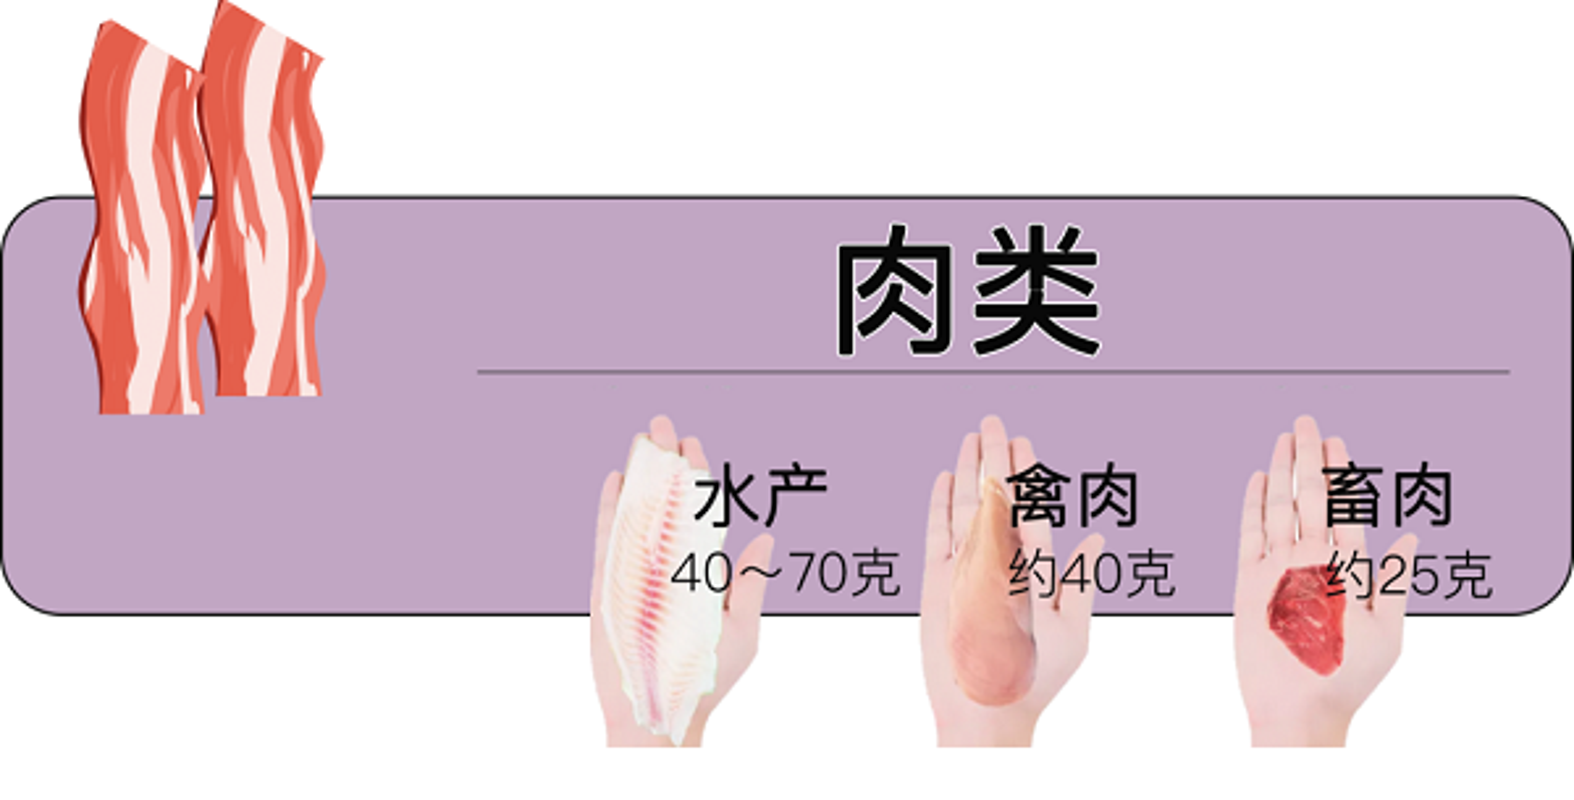 Sai lam khi an khien gan nhiem mo, hai suc khoe-Hinh-8